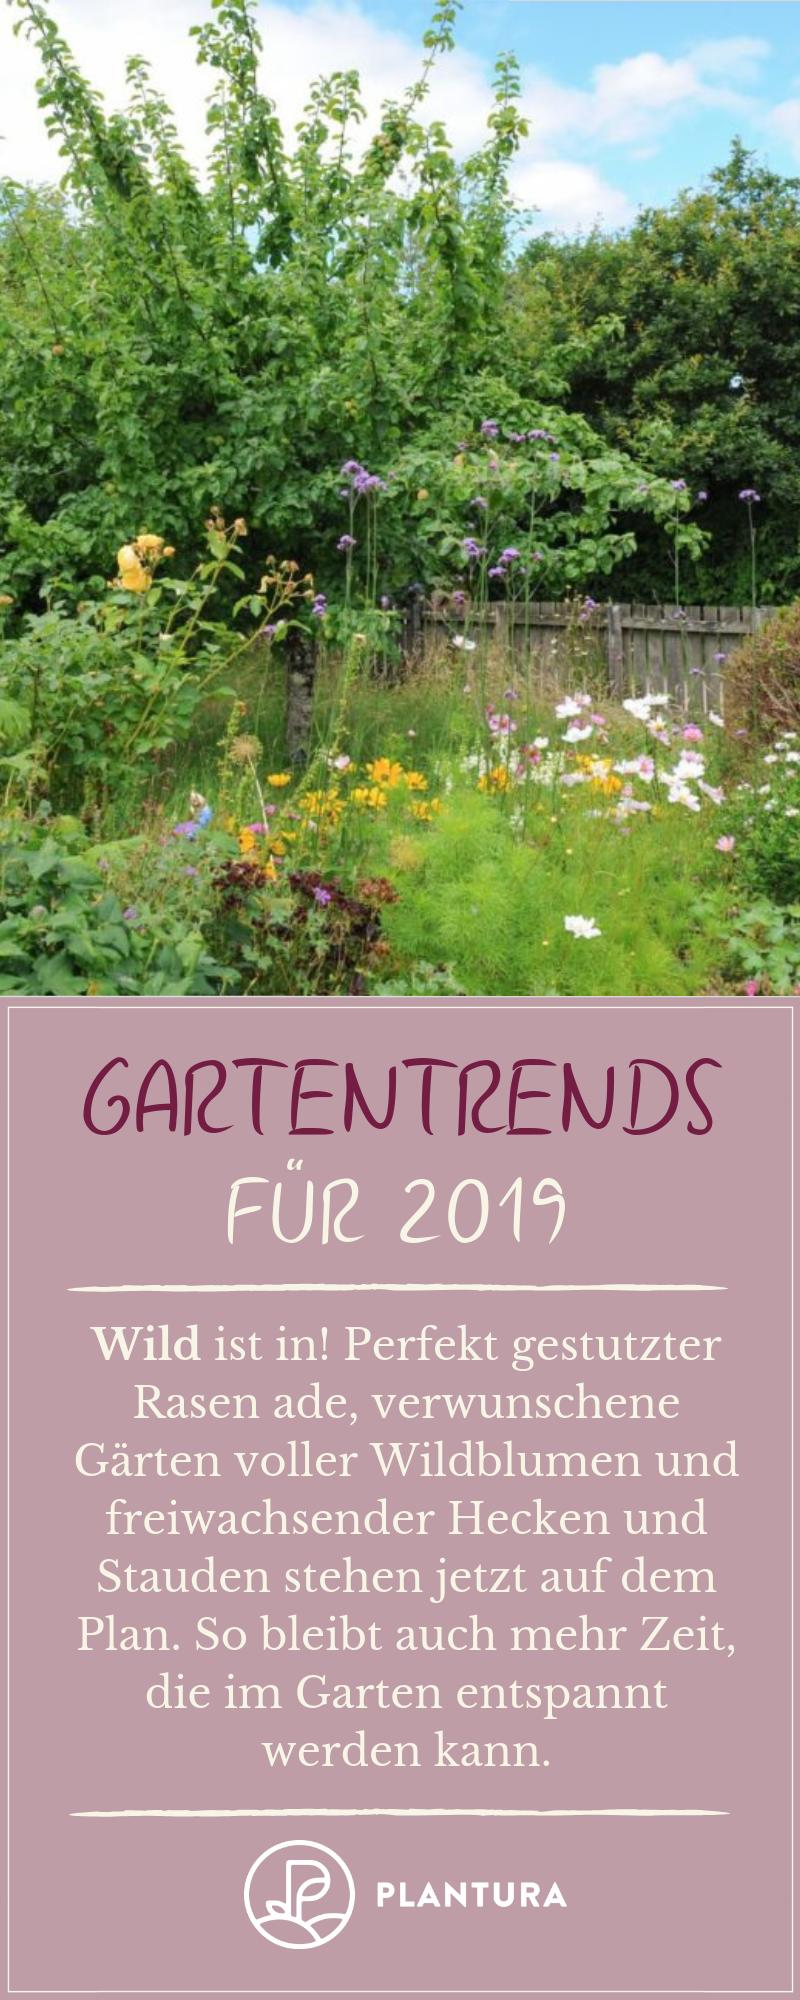 Gartentrends 2019 Naturnahe Garten Penible Geschnittener Rasen Muss Nicht Mehr Sein Leicht Verweilderte Garten Be Naturnaher Garten Garten Straucher Garten